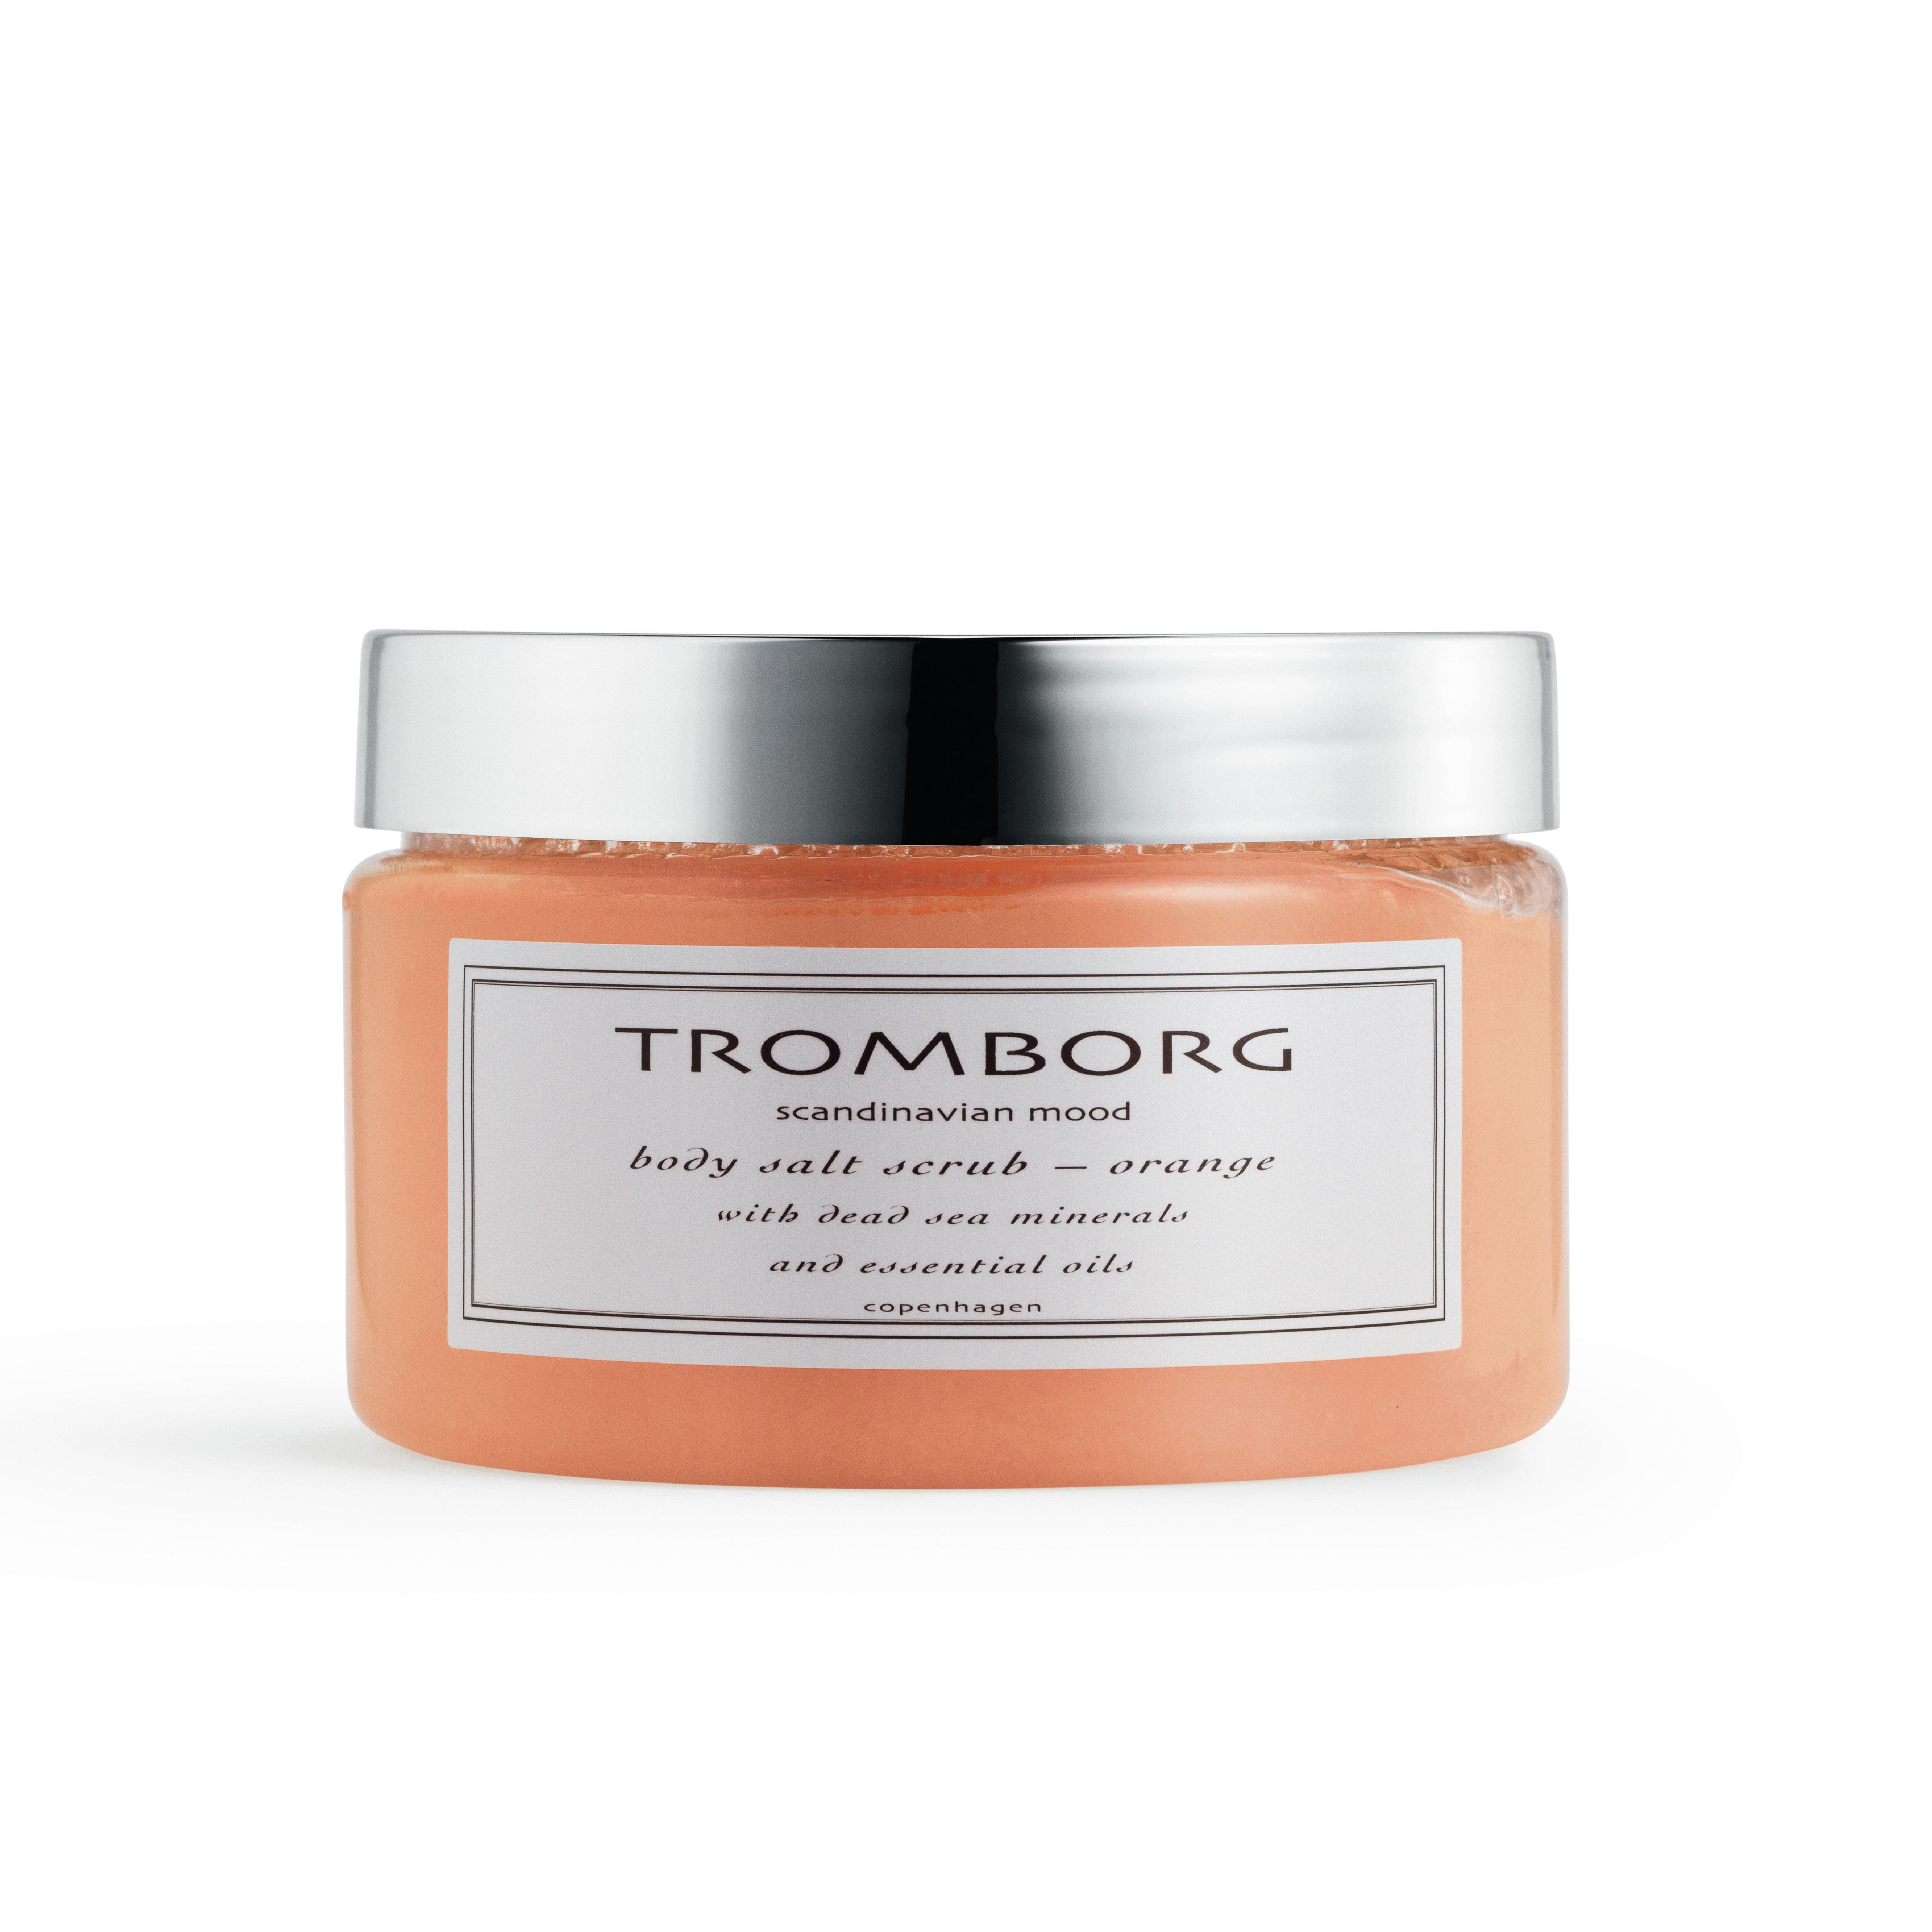 Tromborg Body Salt Scrub, orange, 350 ml